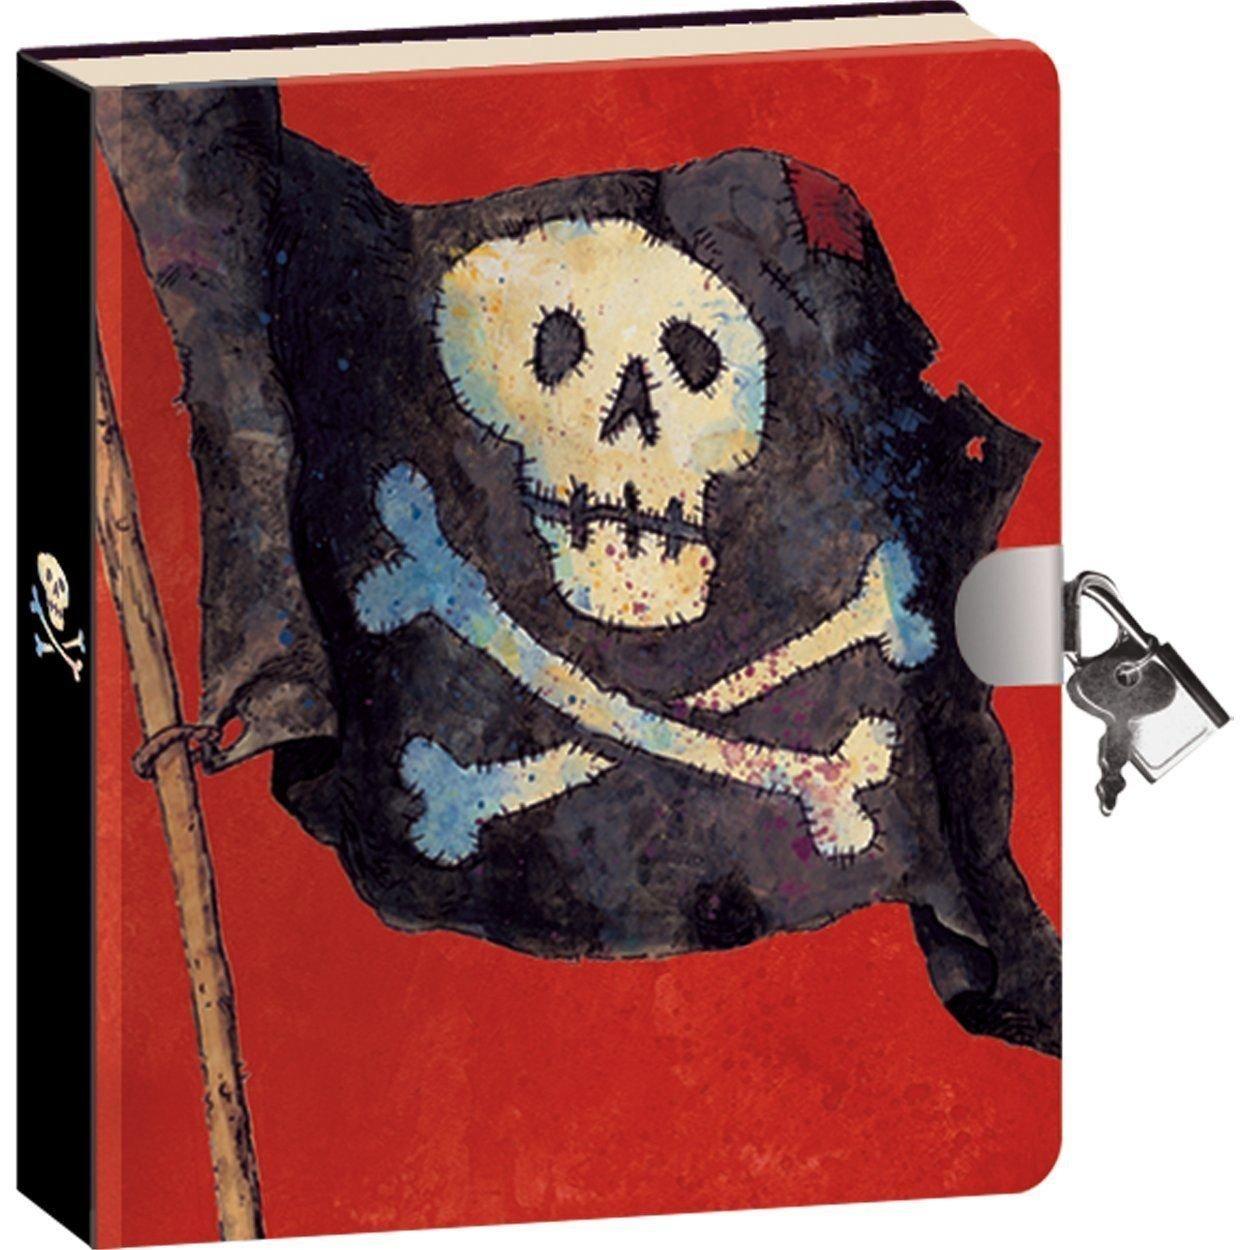 Peaceable Kingdom-Pirate-Lock and KeyDiary 4220